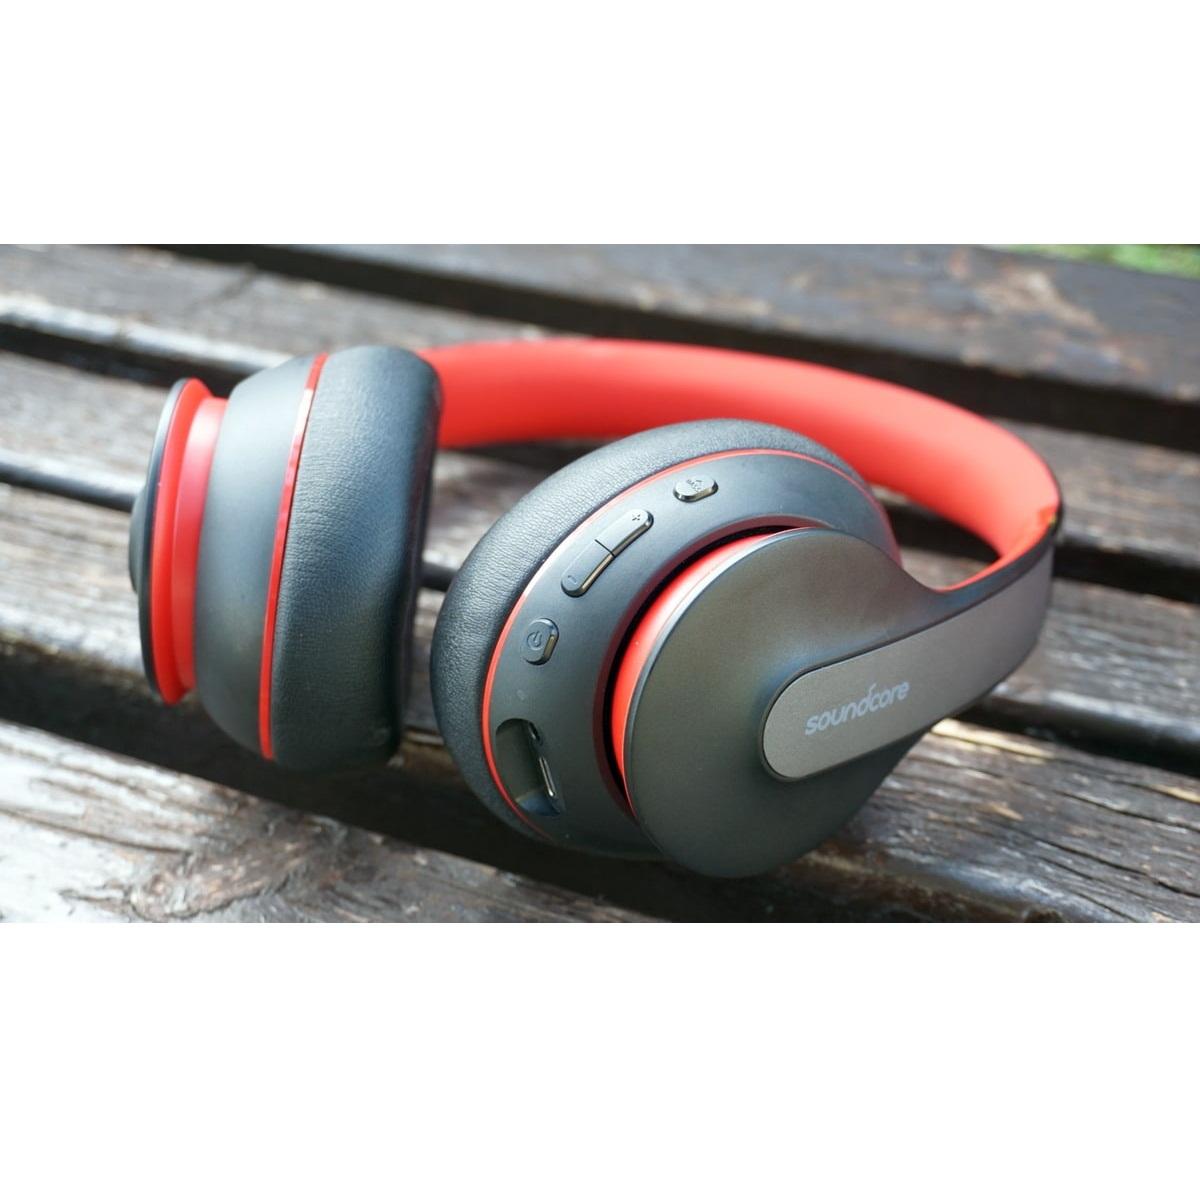 Fone de Ouvido Bluetooth Anker Soundcore Life Q10 Cod. 11156818